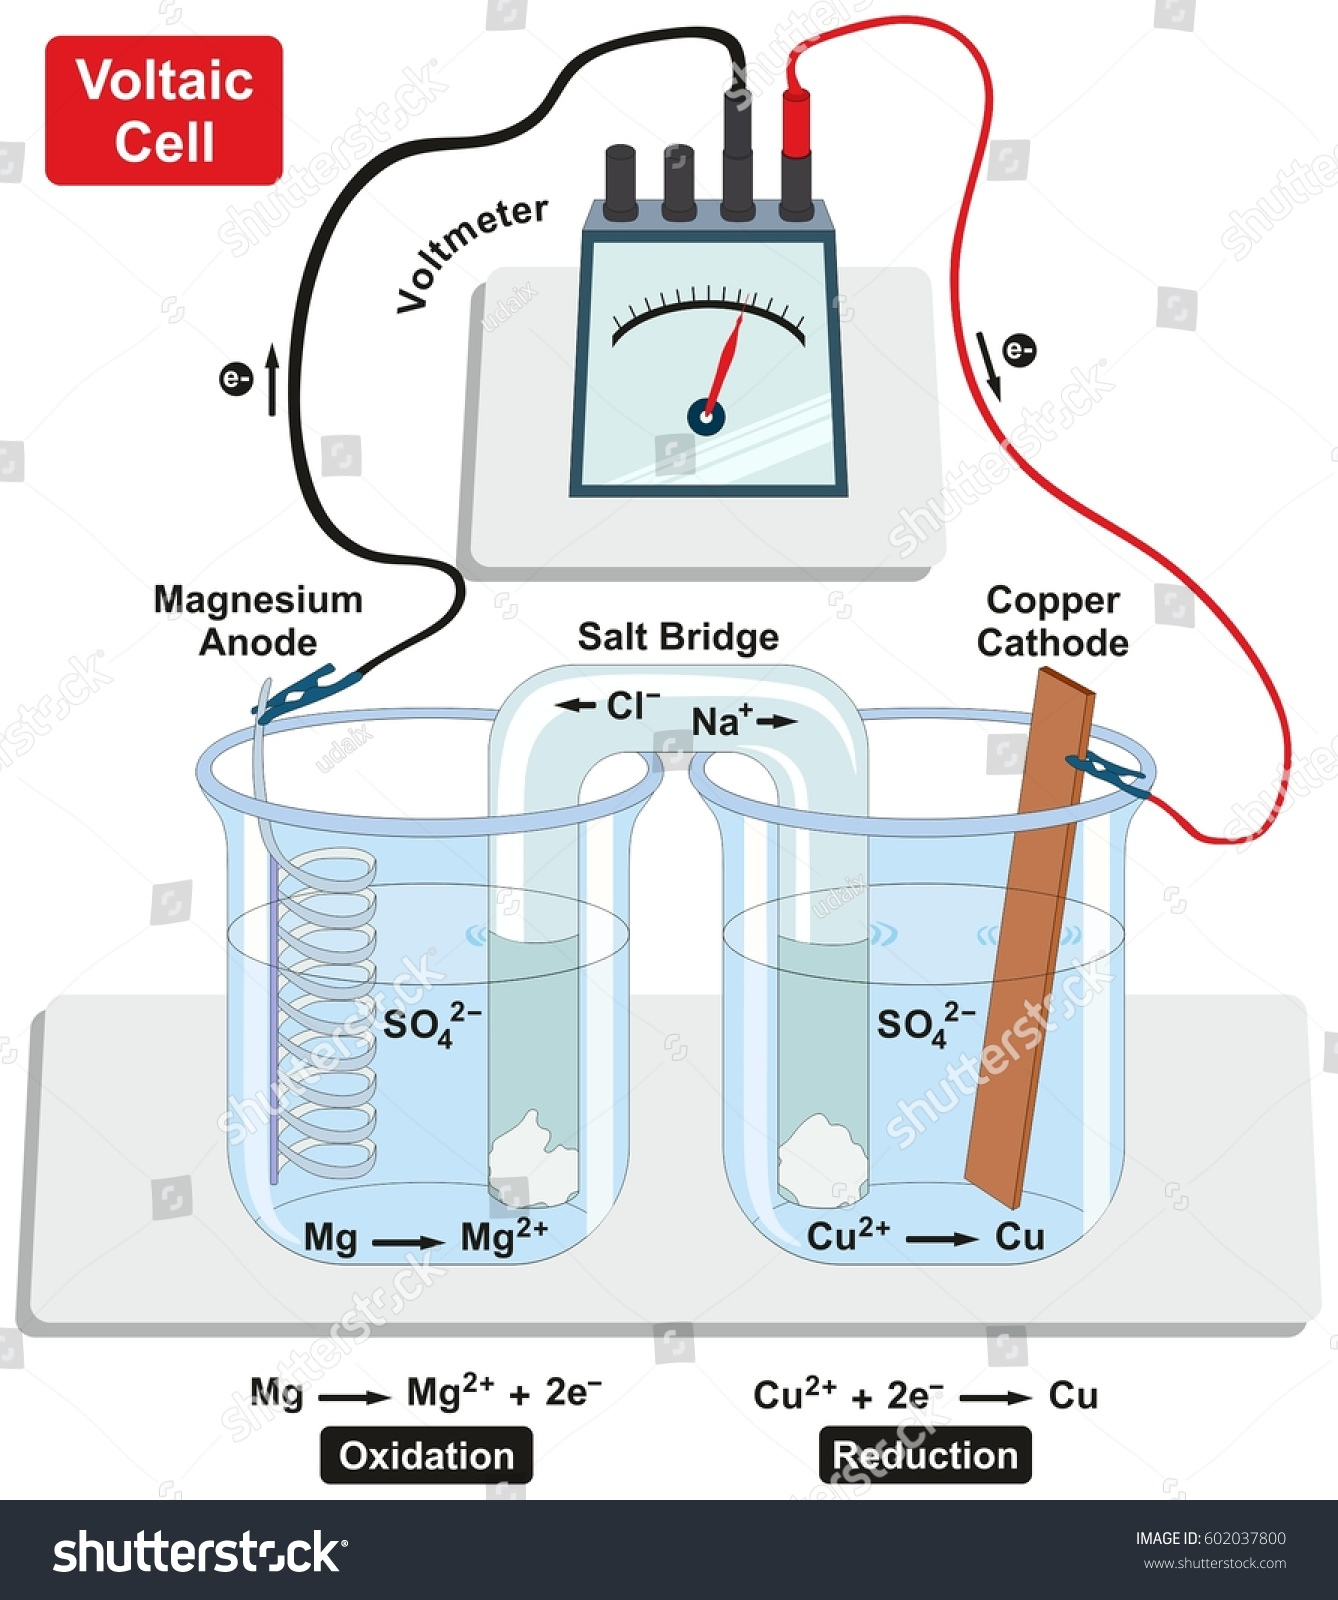 Lemon Battery Voltmeter Diagram Data Wiring Diagrams Potato Dry Cell Homedecoringideas Us Experiment Results